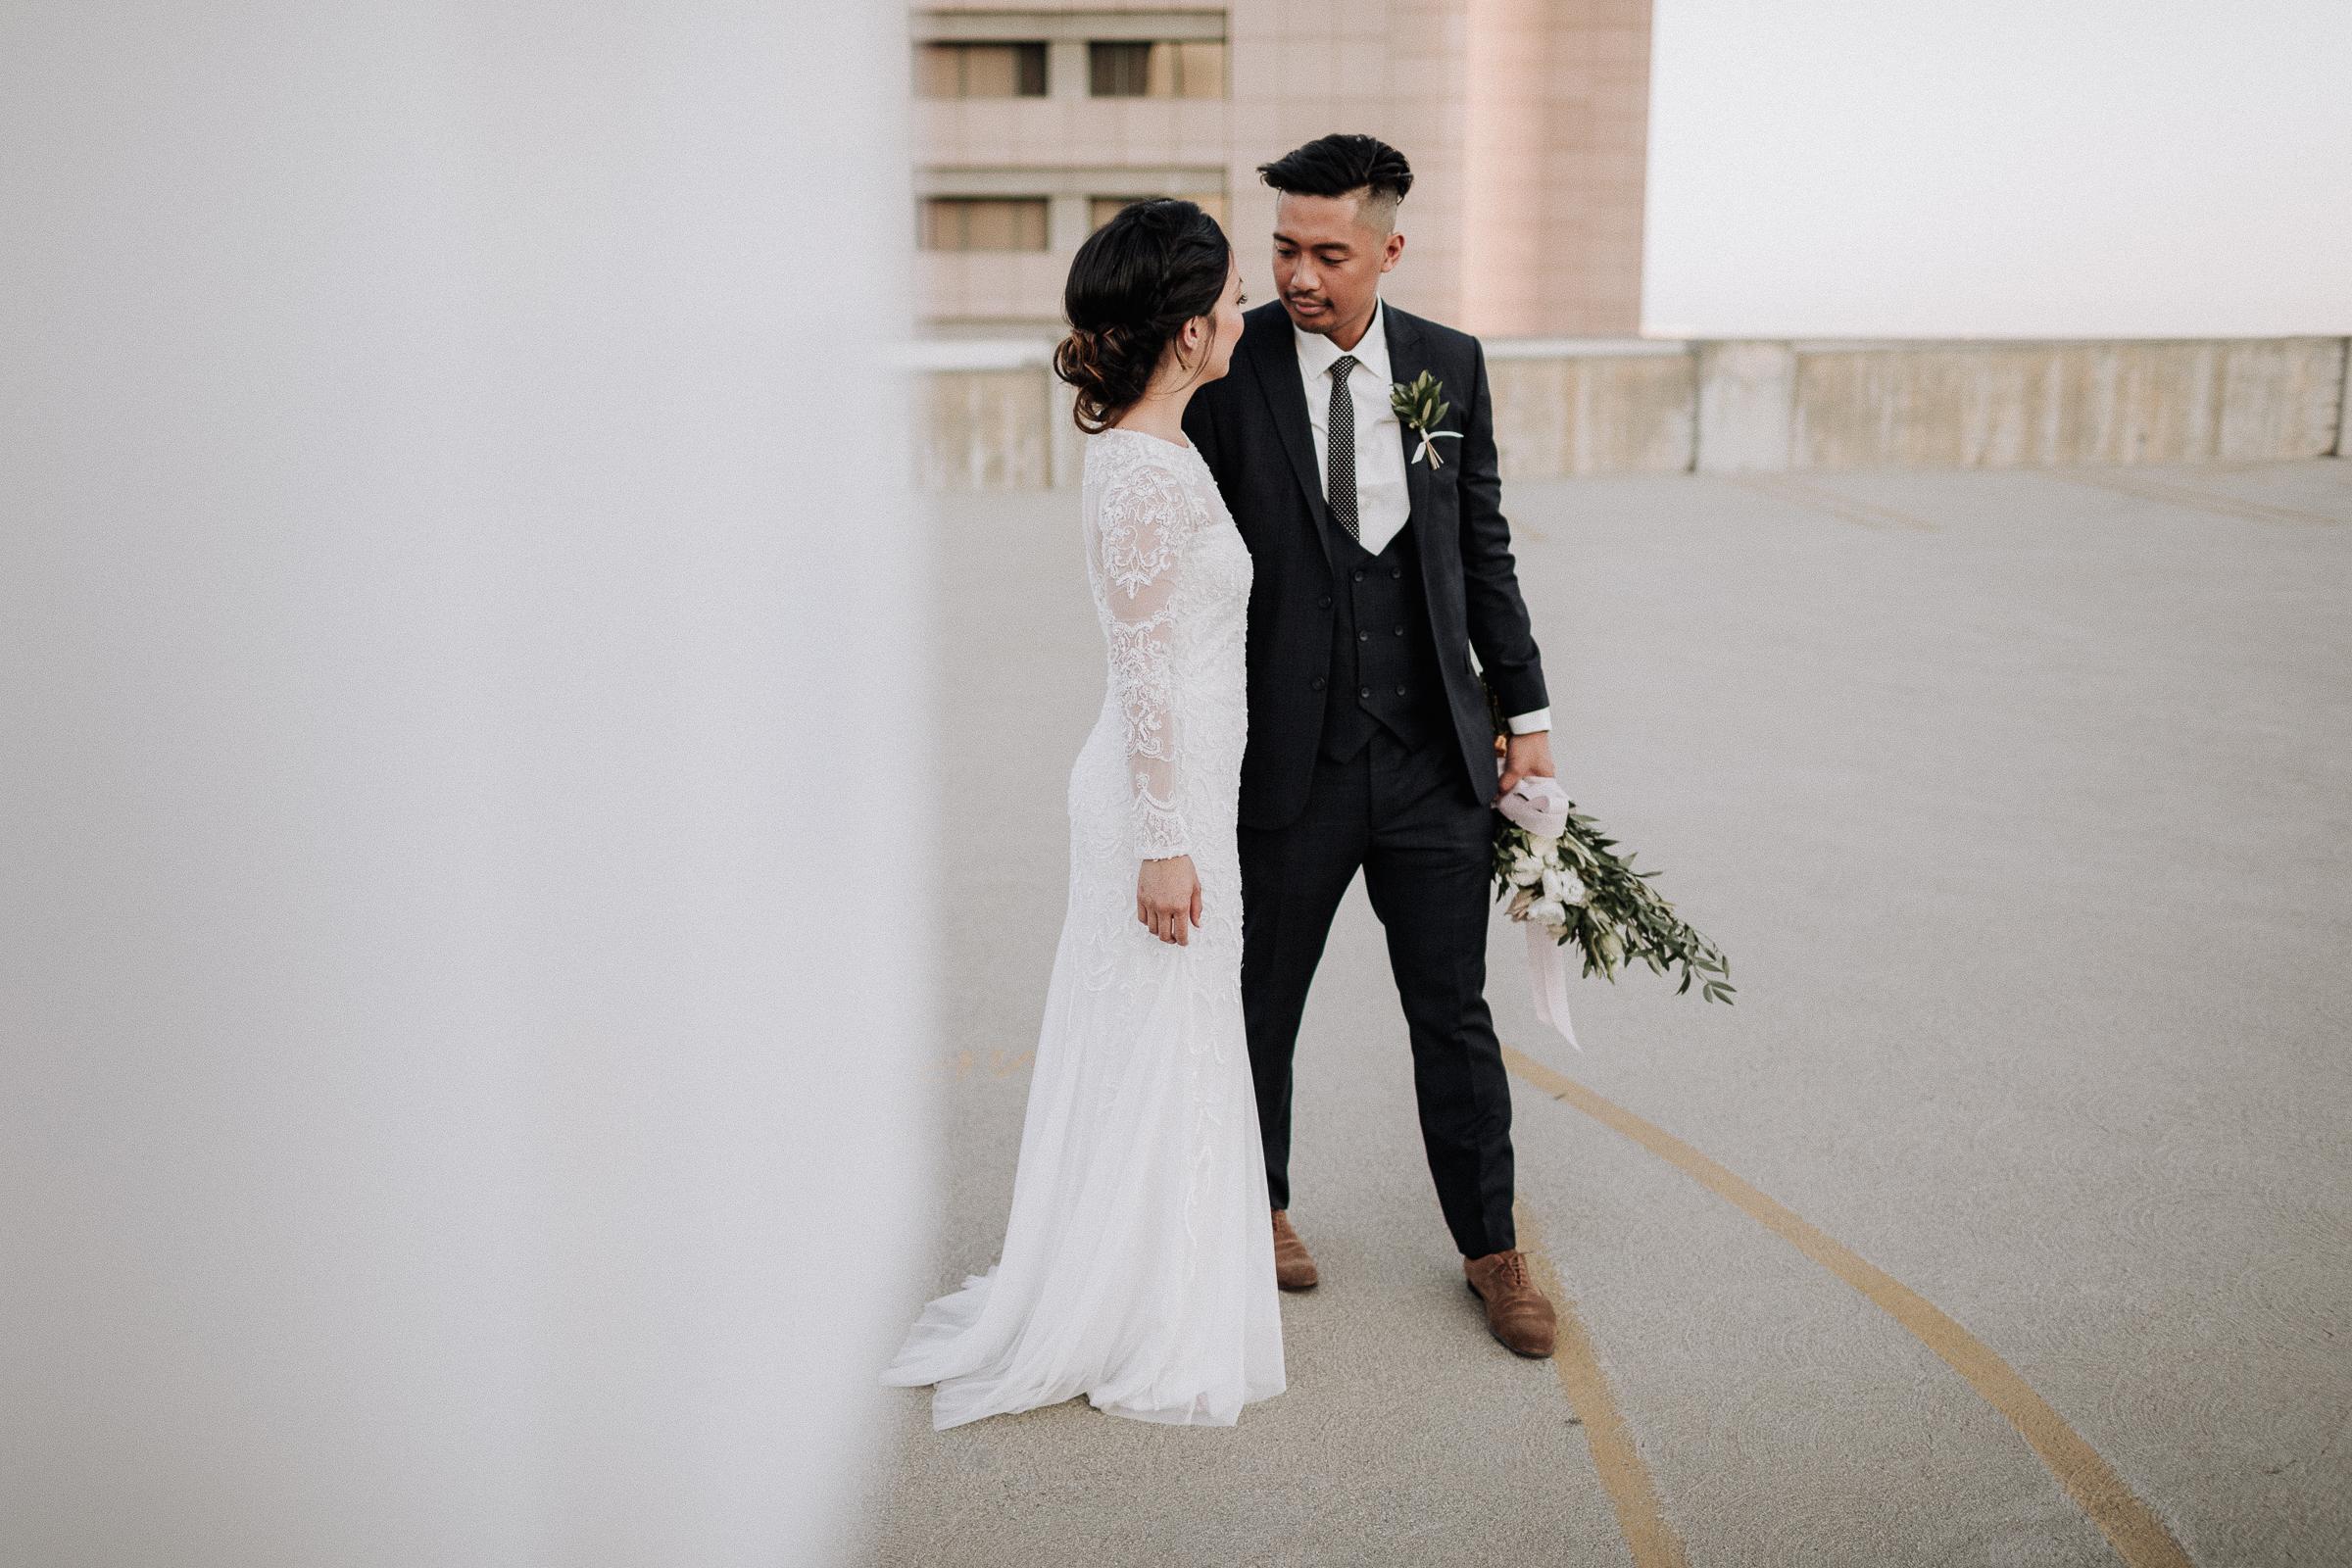 gretchen_gause_san_francisco_wedding_photo-56.jpg